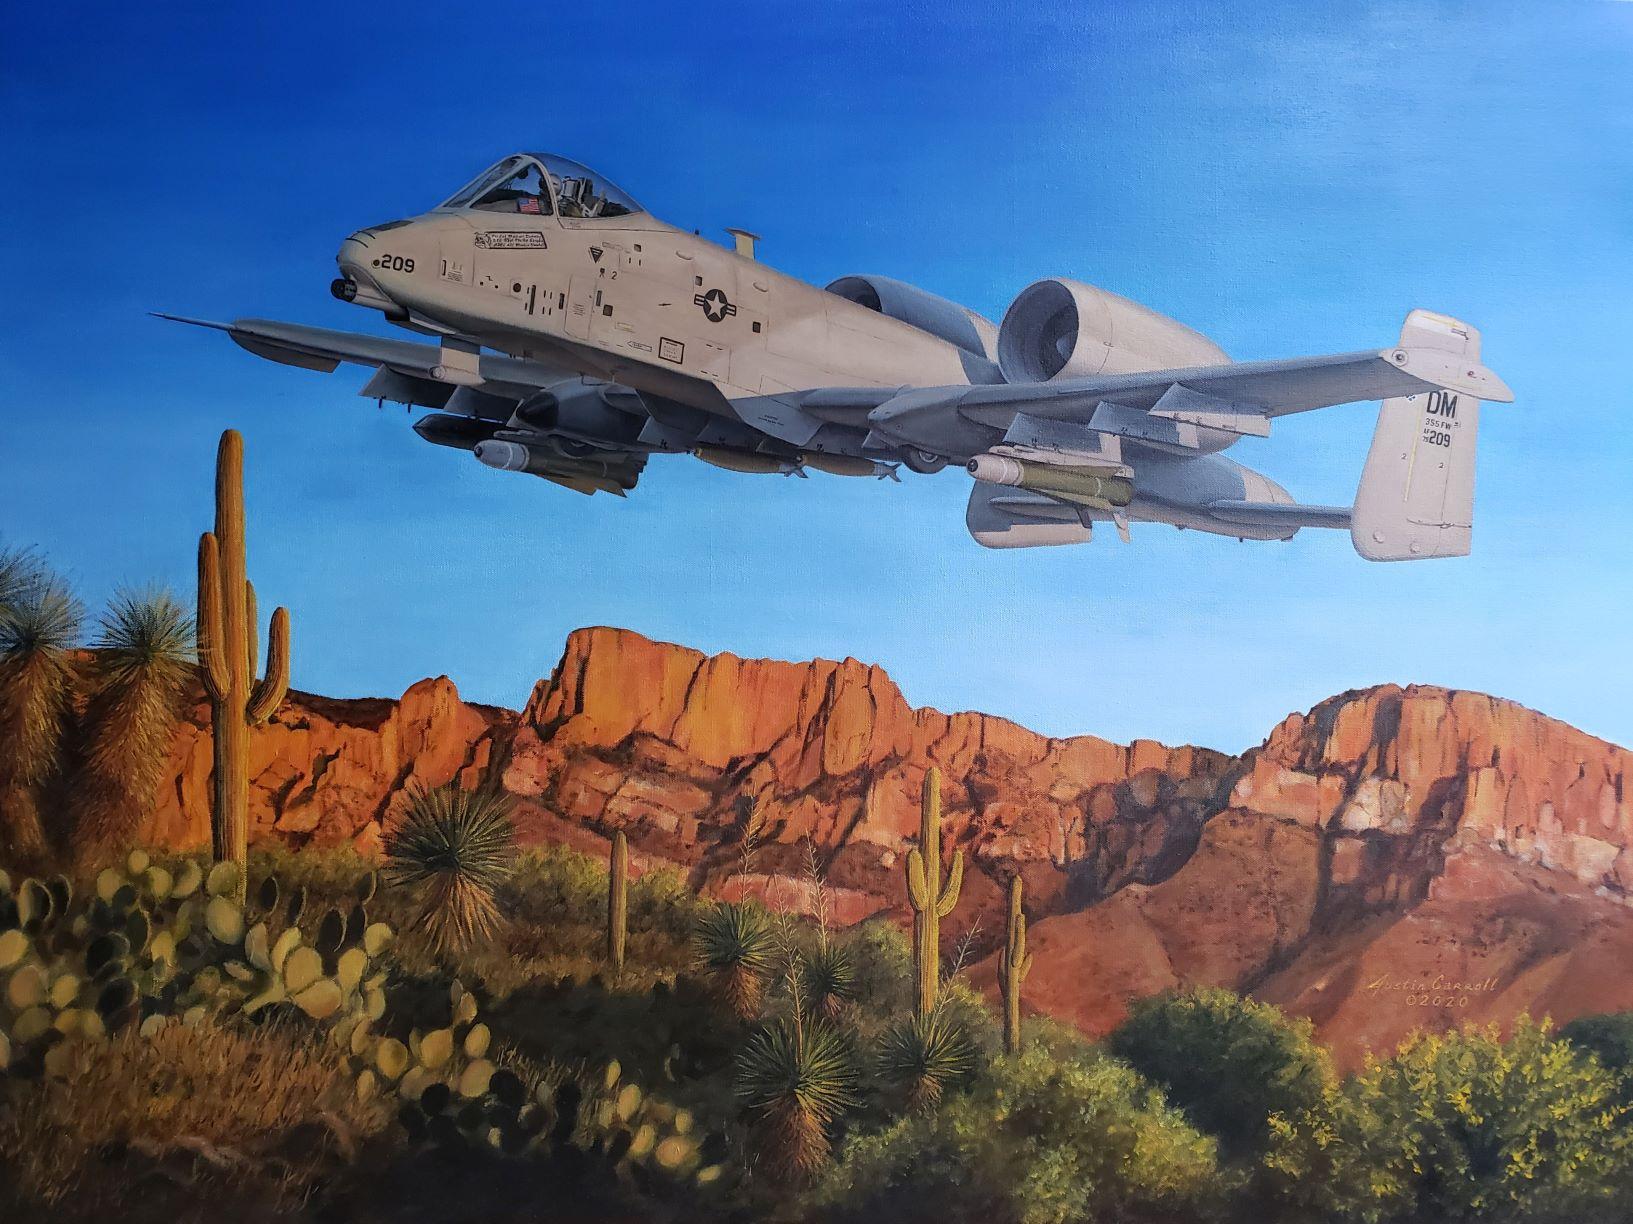 355th FW A-10C